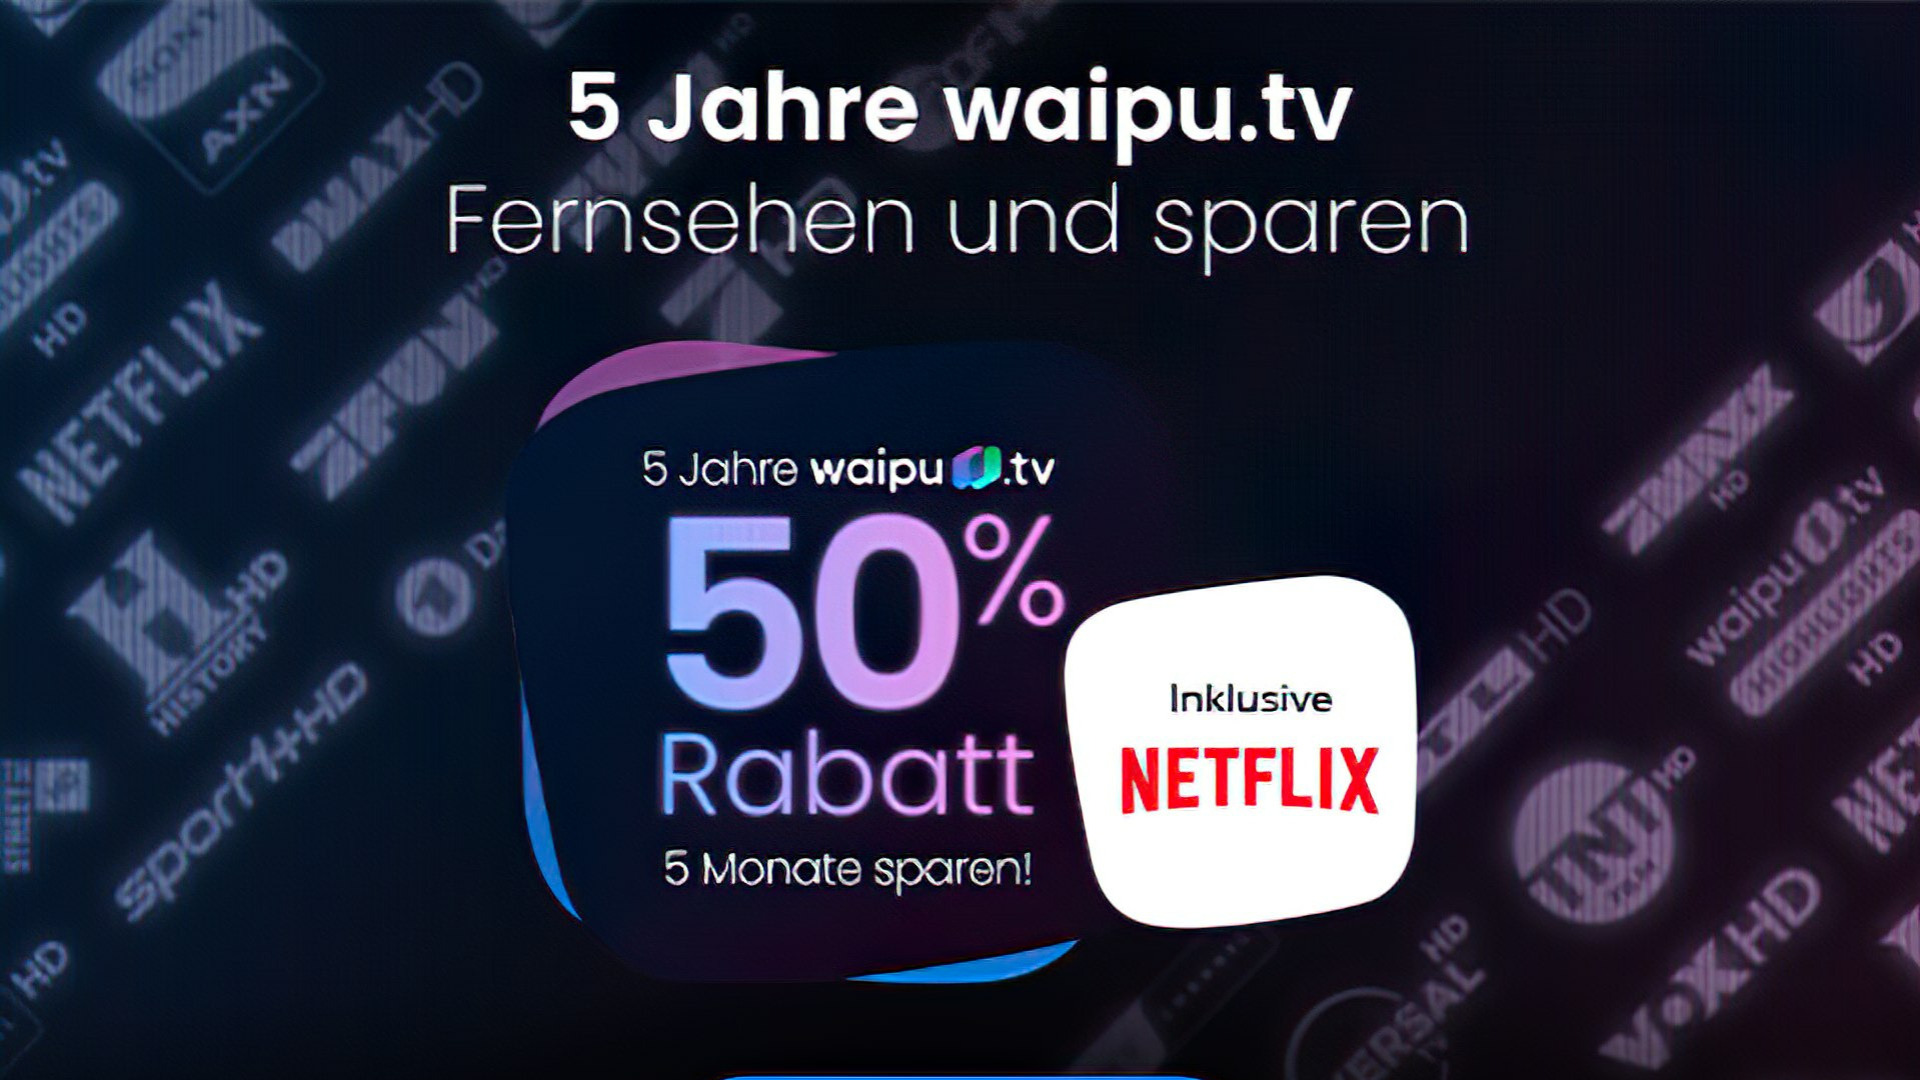 Streaming, Tv, Fernsehen, Netflix, Streamingportal, Rabatt, Waipu.tv, waipu